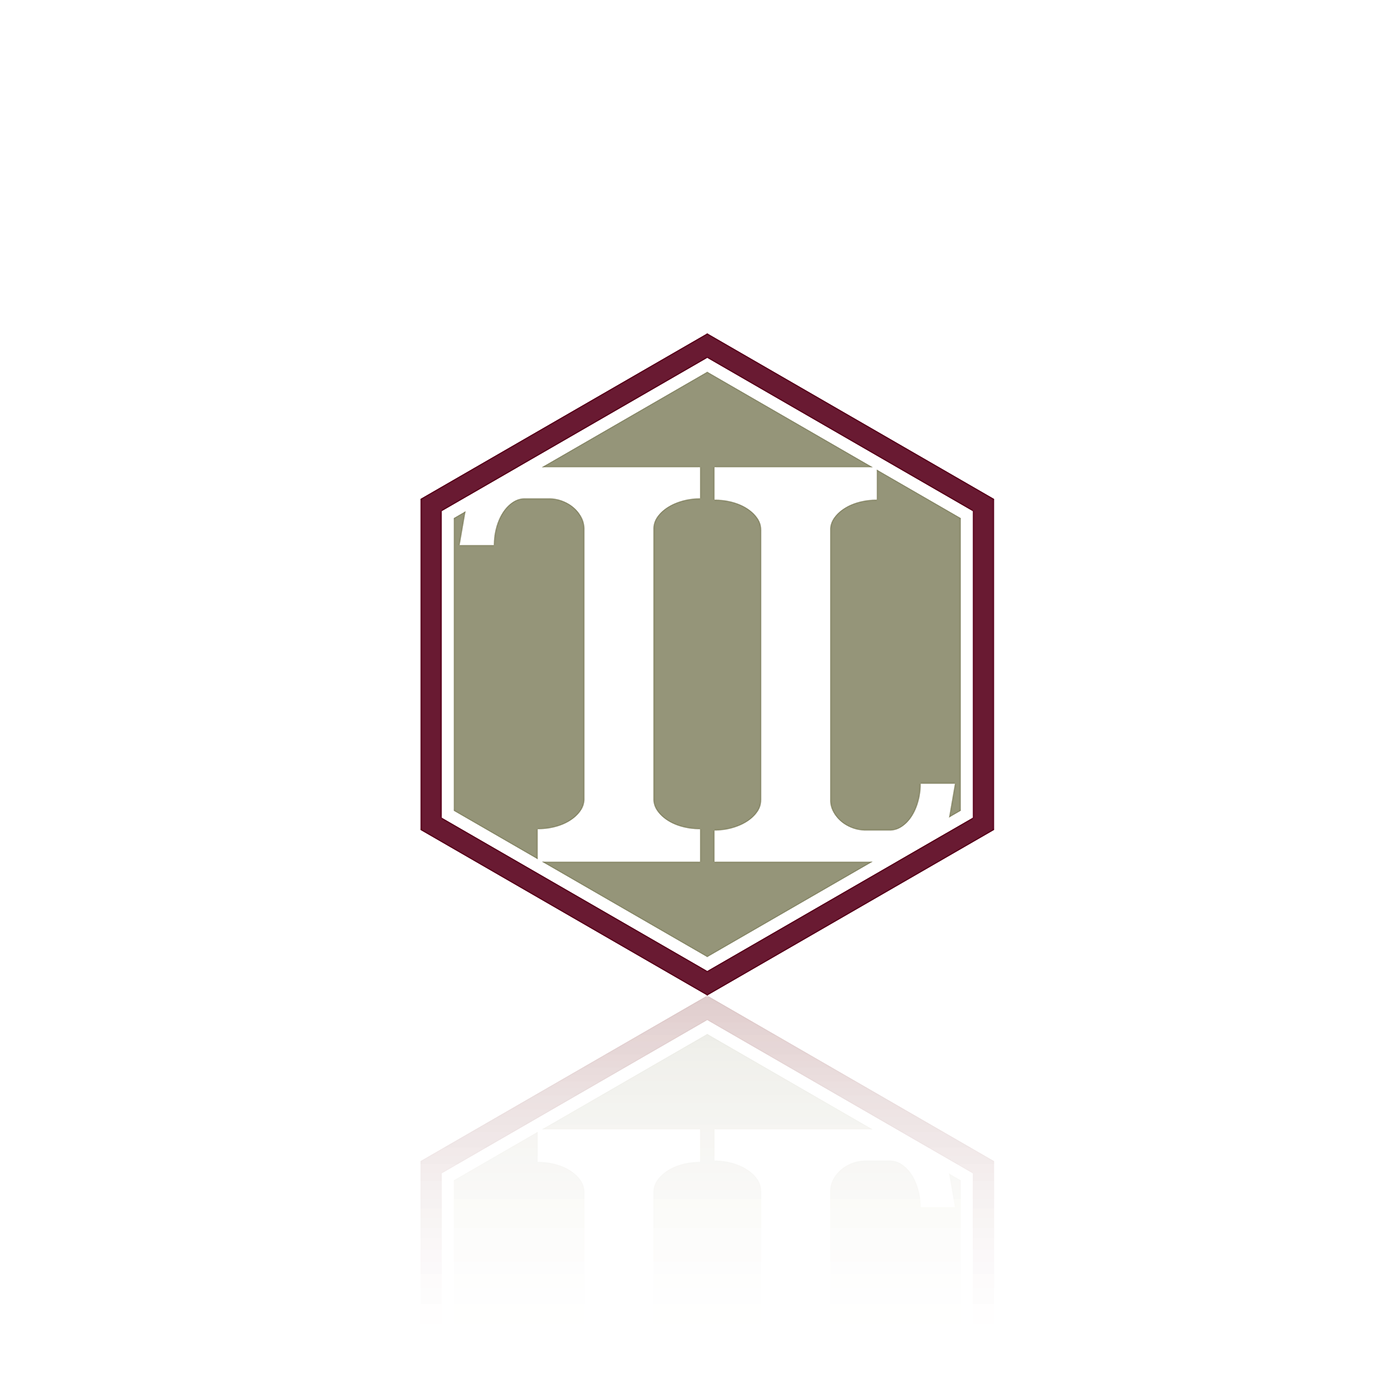 Lawyer Logo Design calgary lawyer logo Calgary Logo Design Calgary Graphic Design yyc logo design legal firm logo laywer graphic design Vixel Design